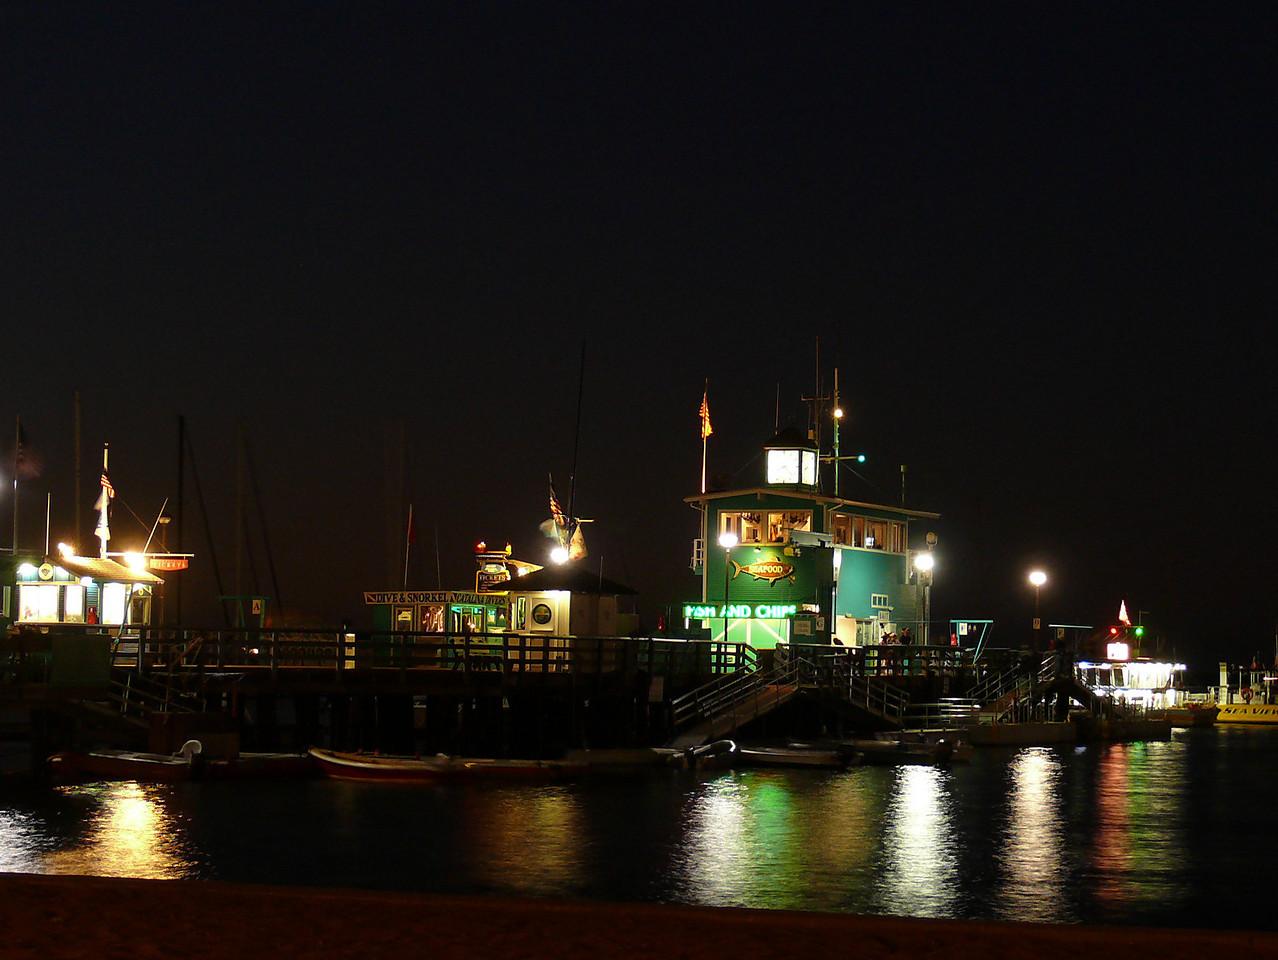 Pier Night Shot